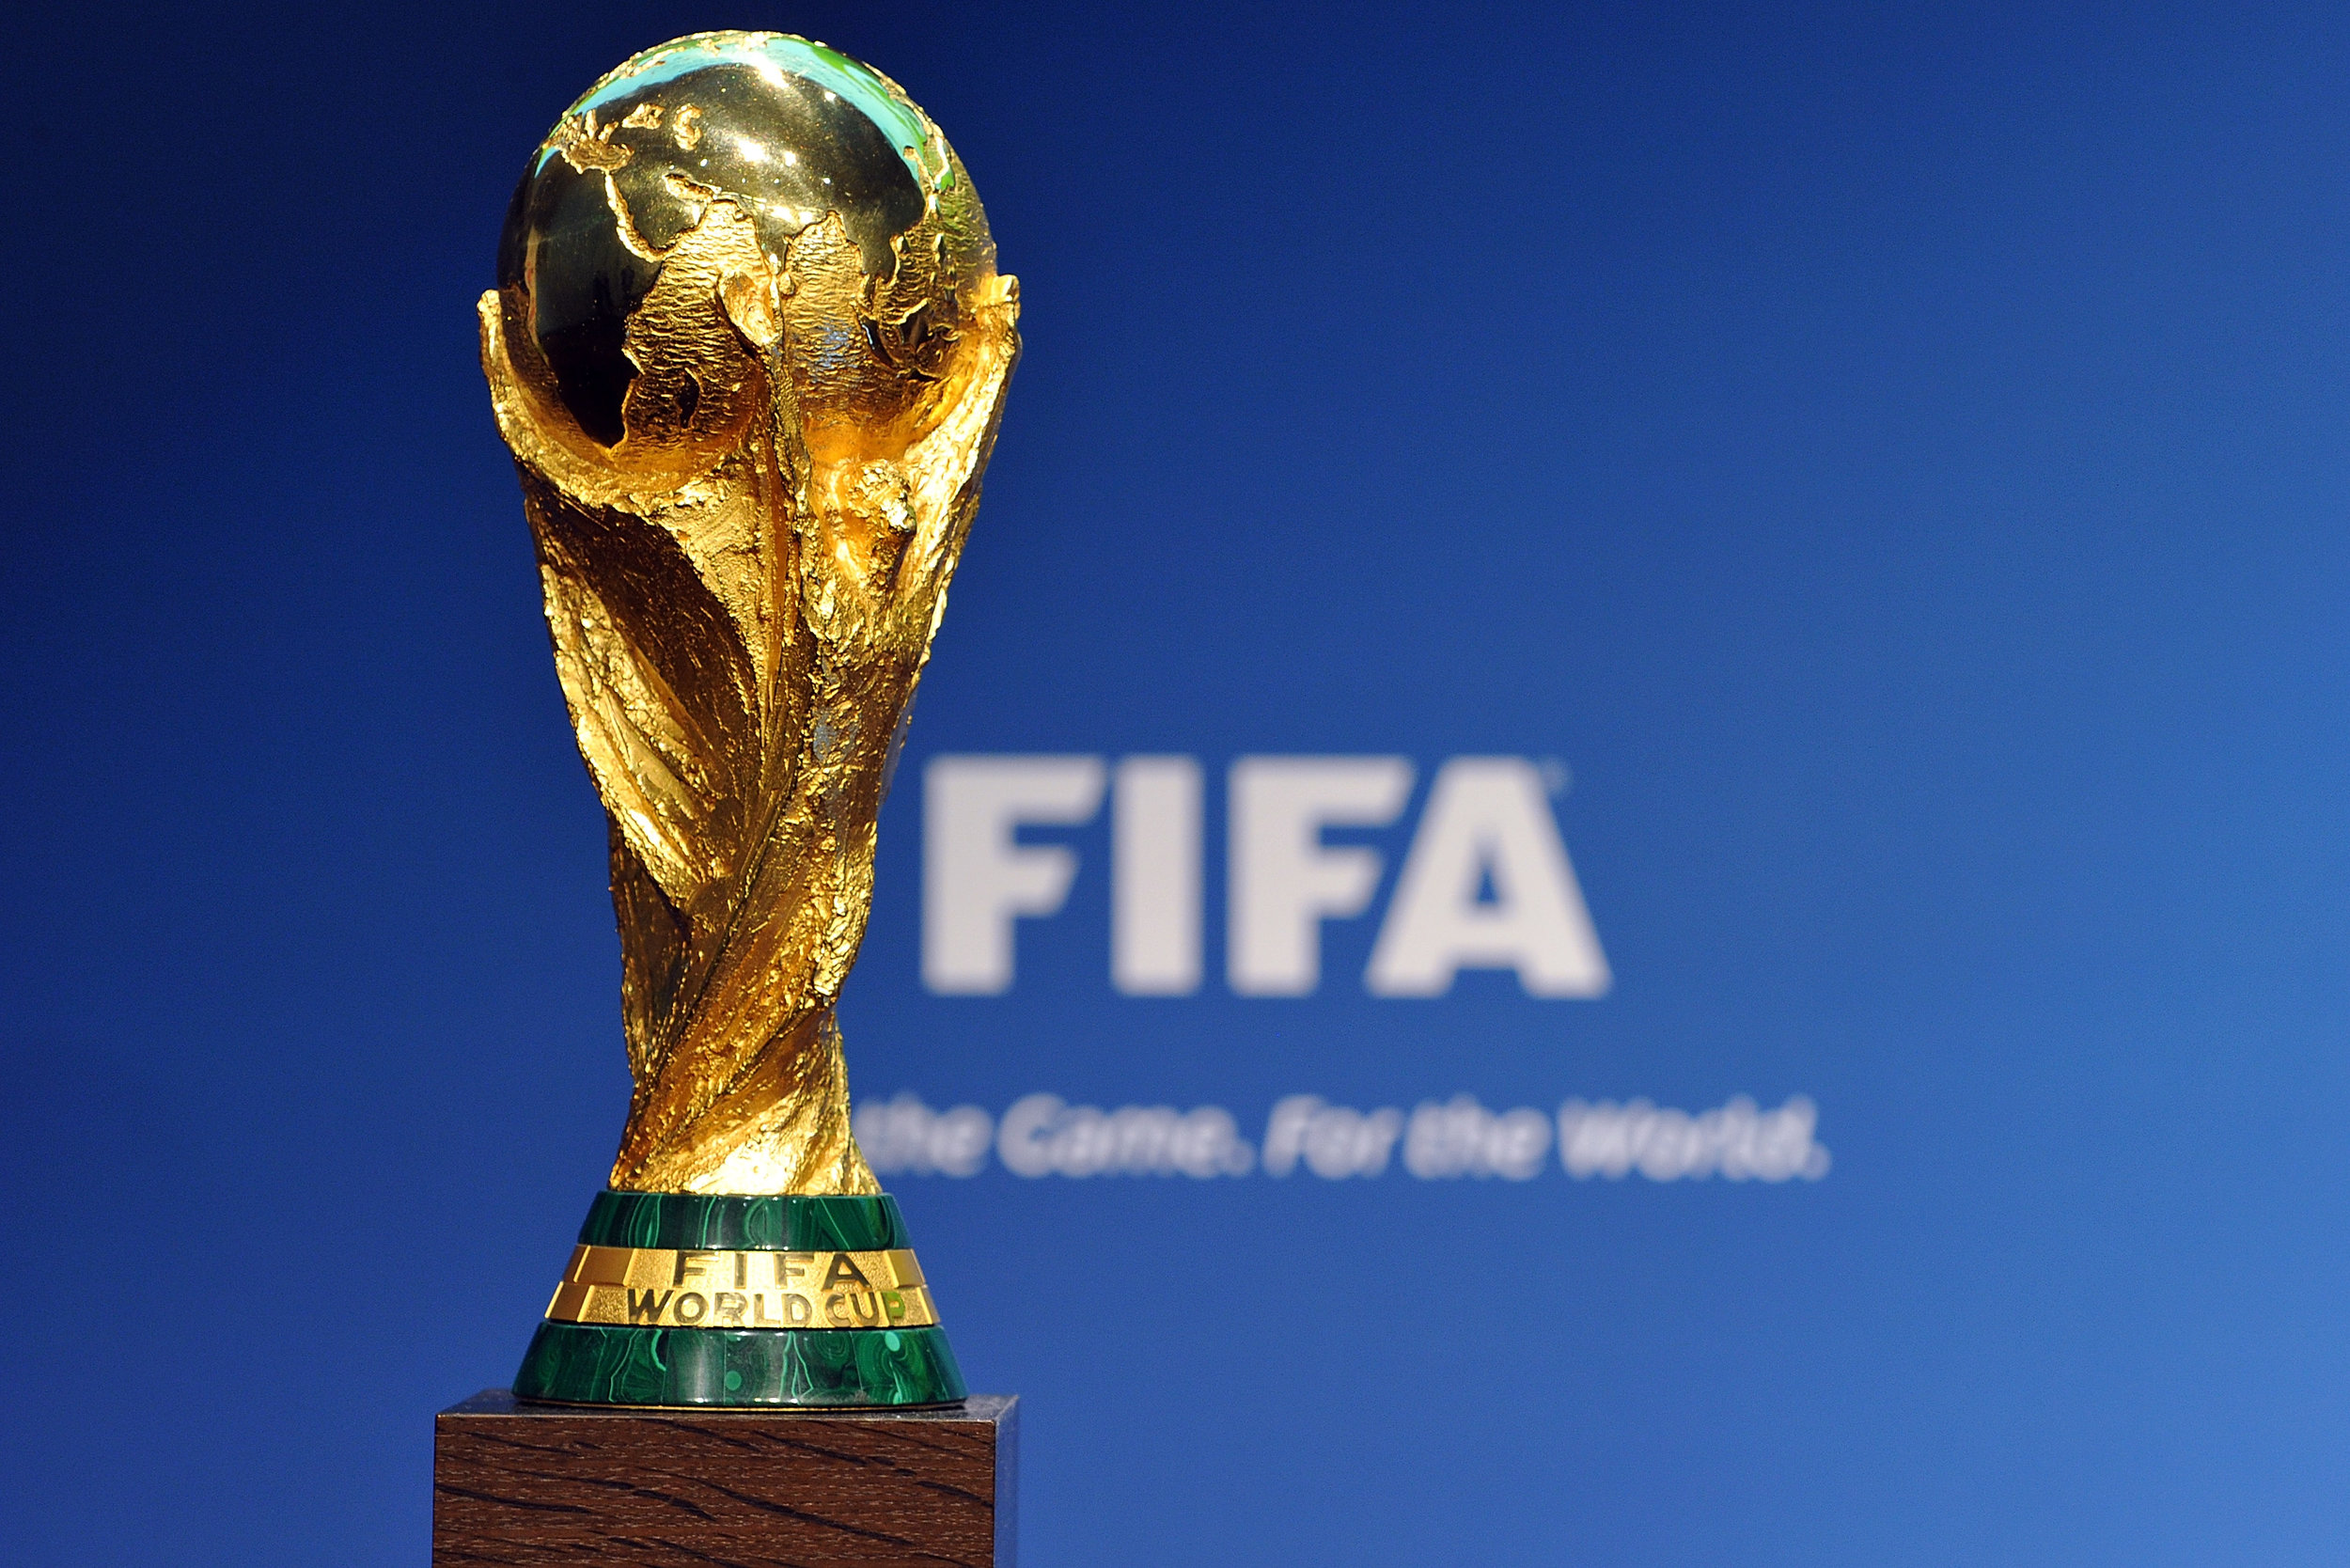 Miro-worldcup.jpg